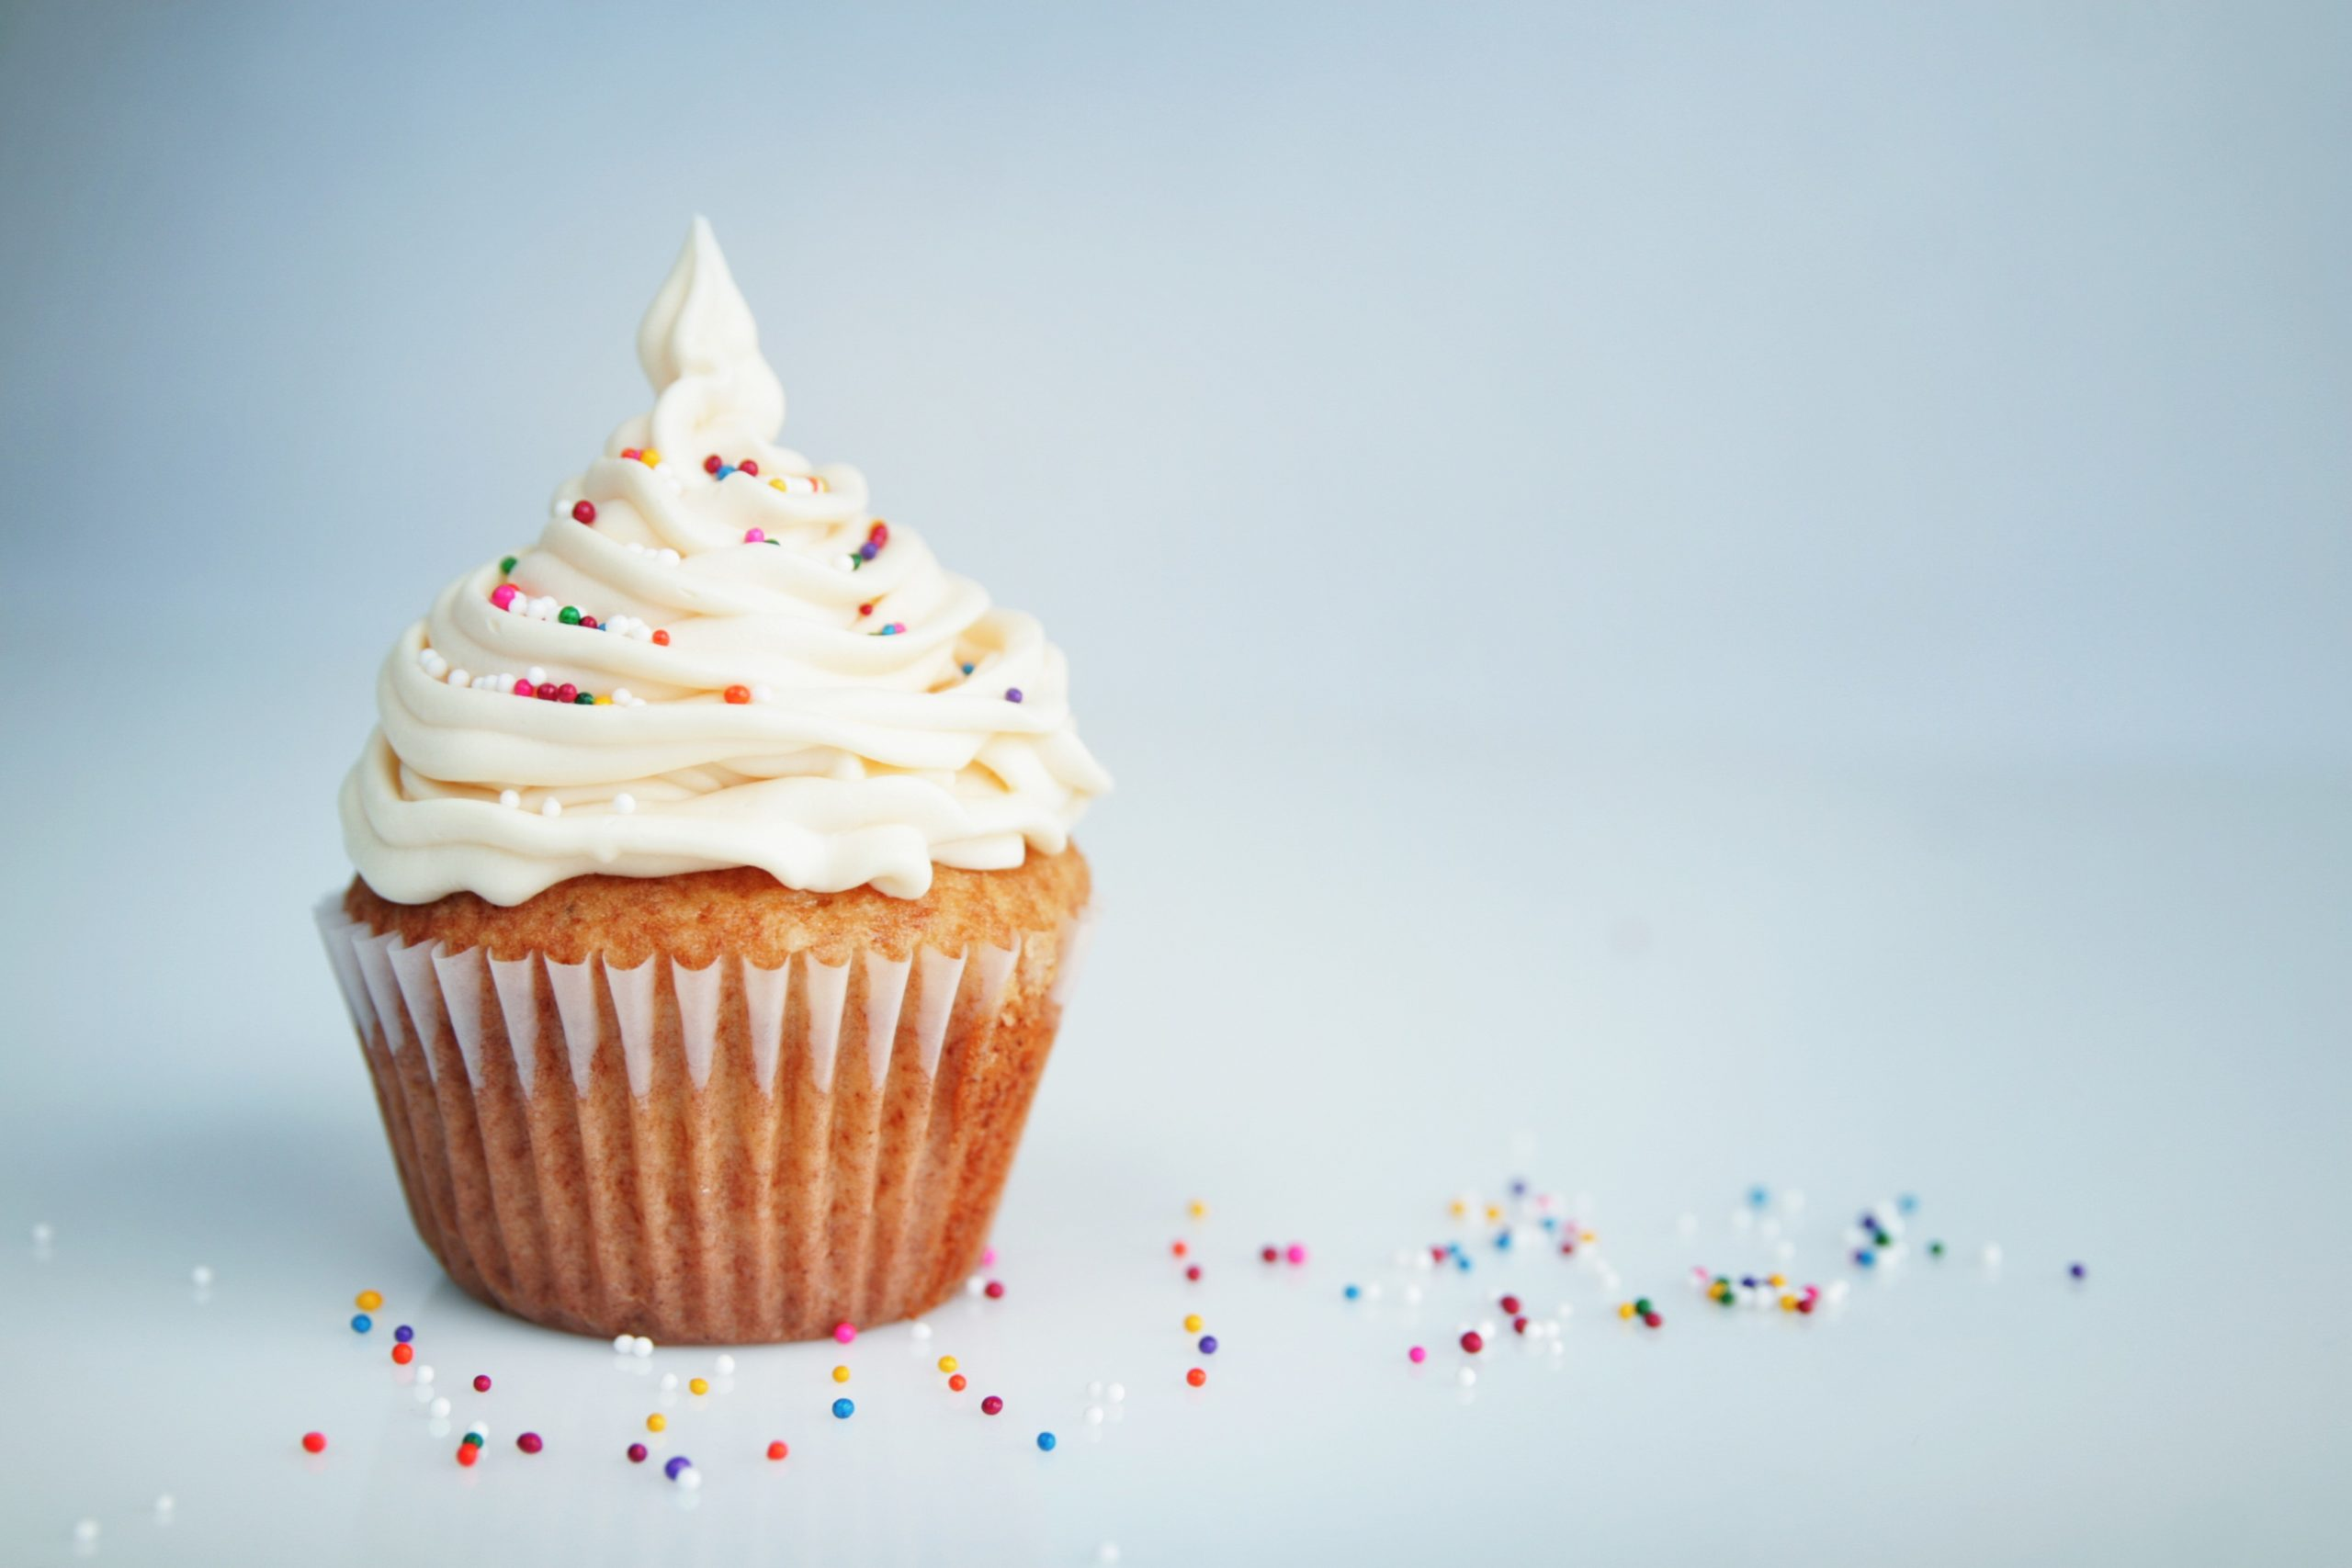 New product range for vegan baked goods closes market gap